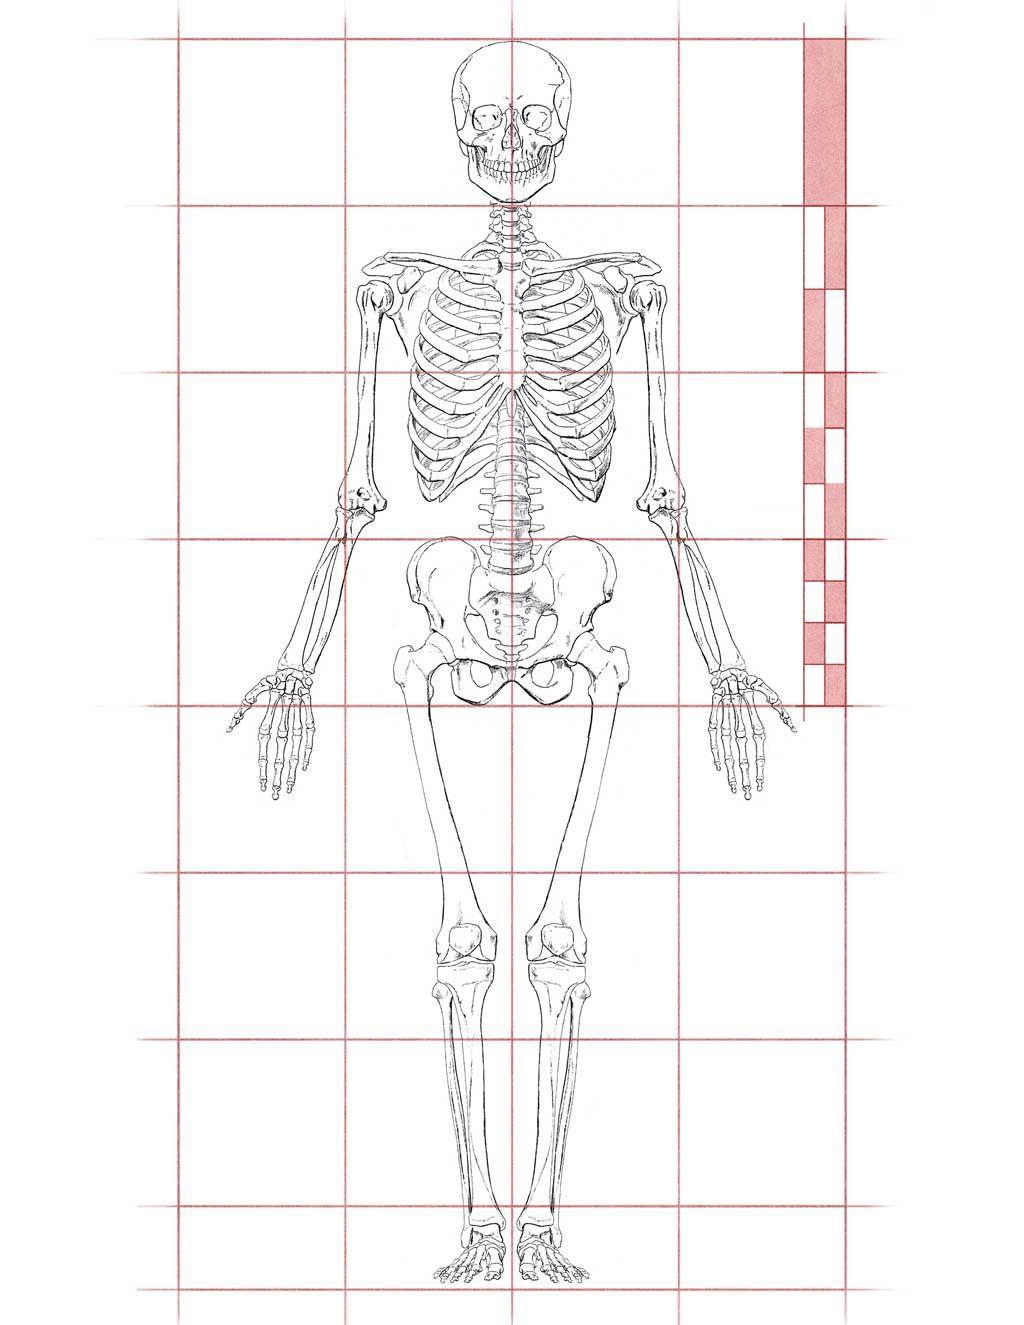 artistic anatomy dr paul richer skeletal study 7 1 2 head proportion study artstudy artanatomy humanproportion proportion skeleton hartman [ 1024 x 1325 Pixel ]